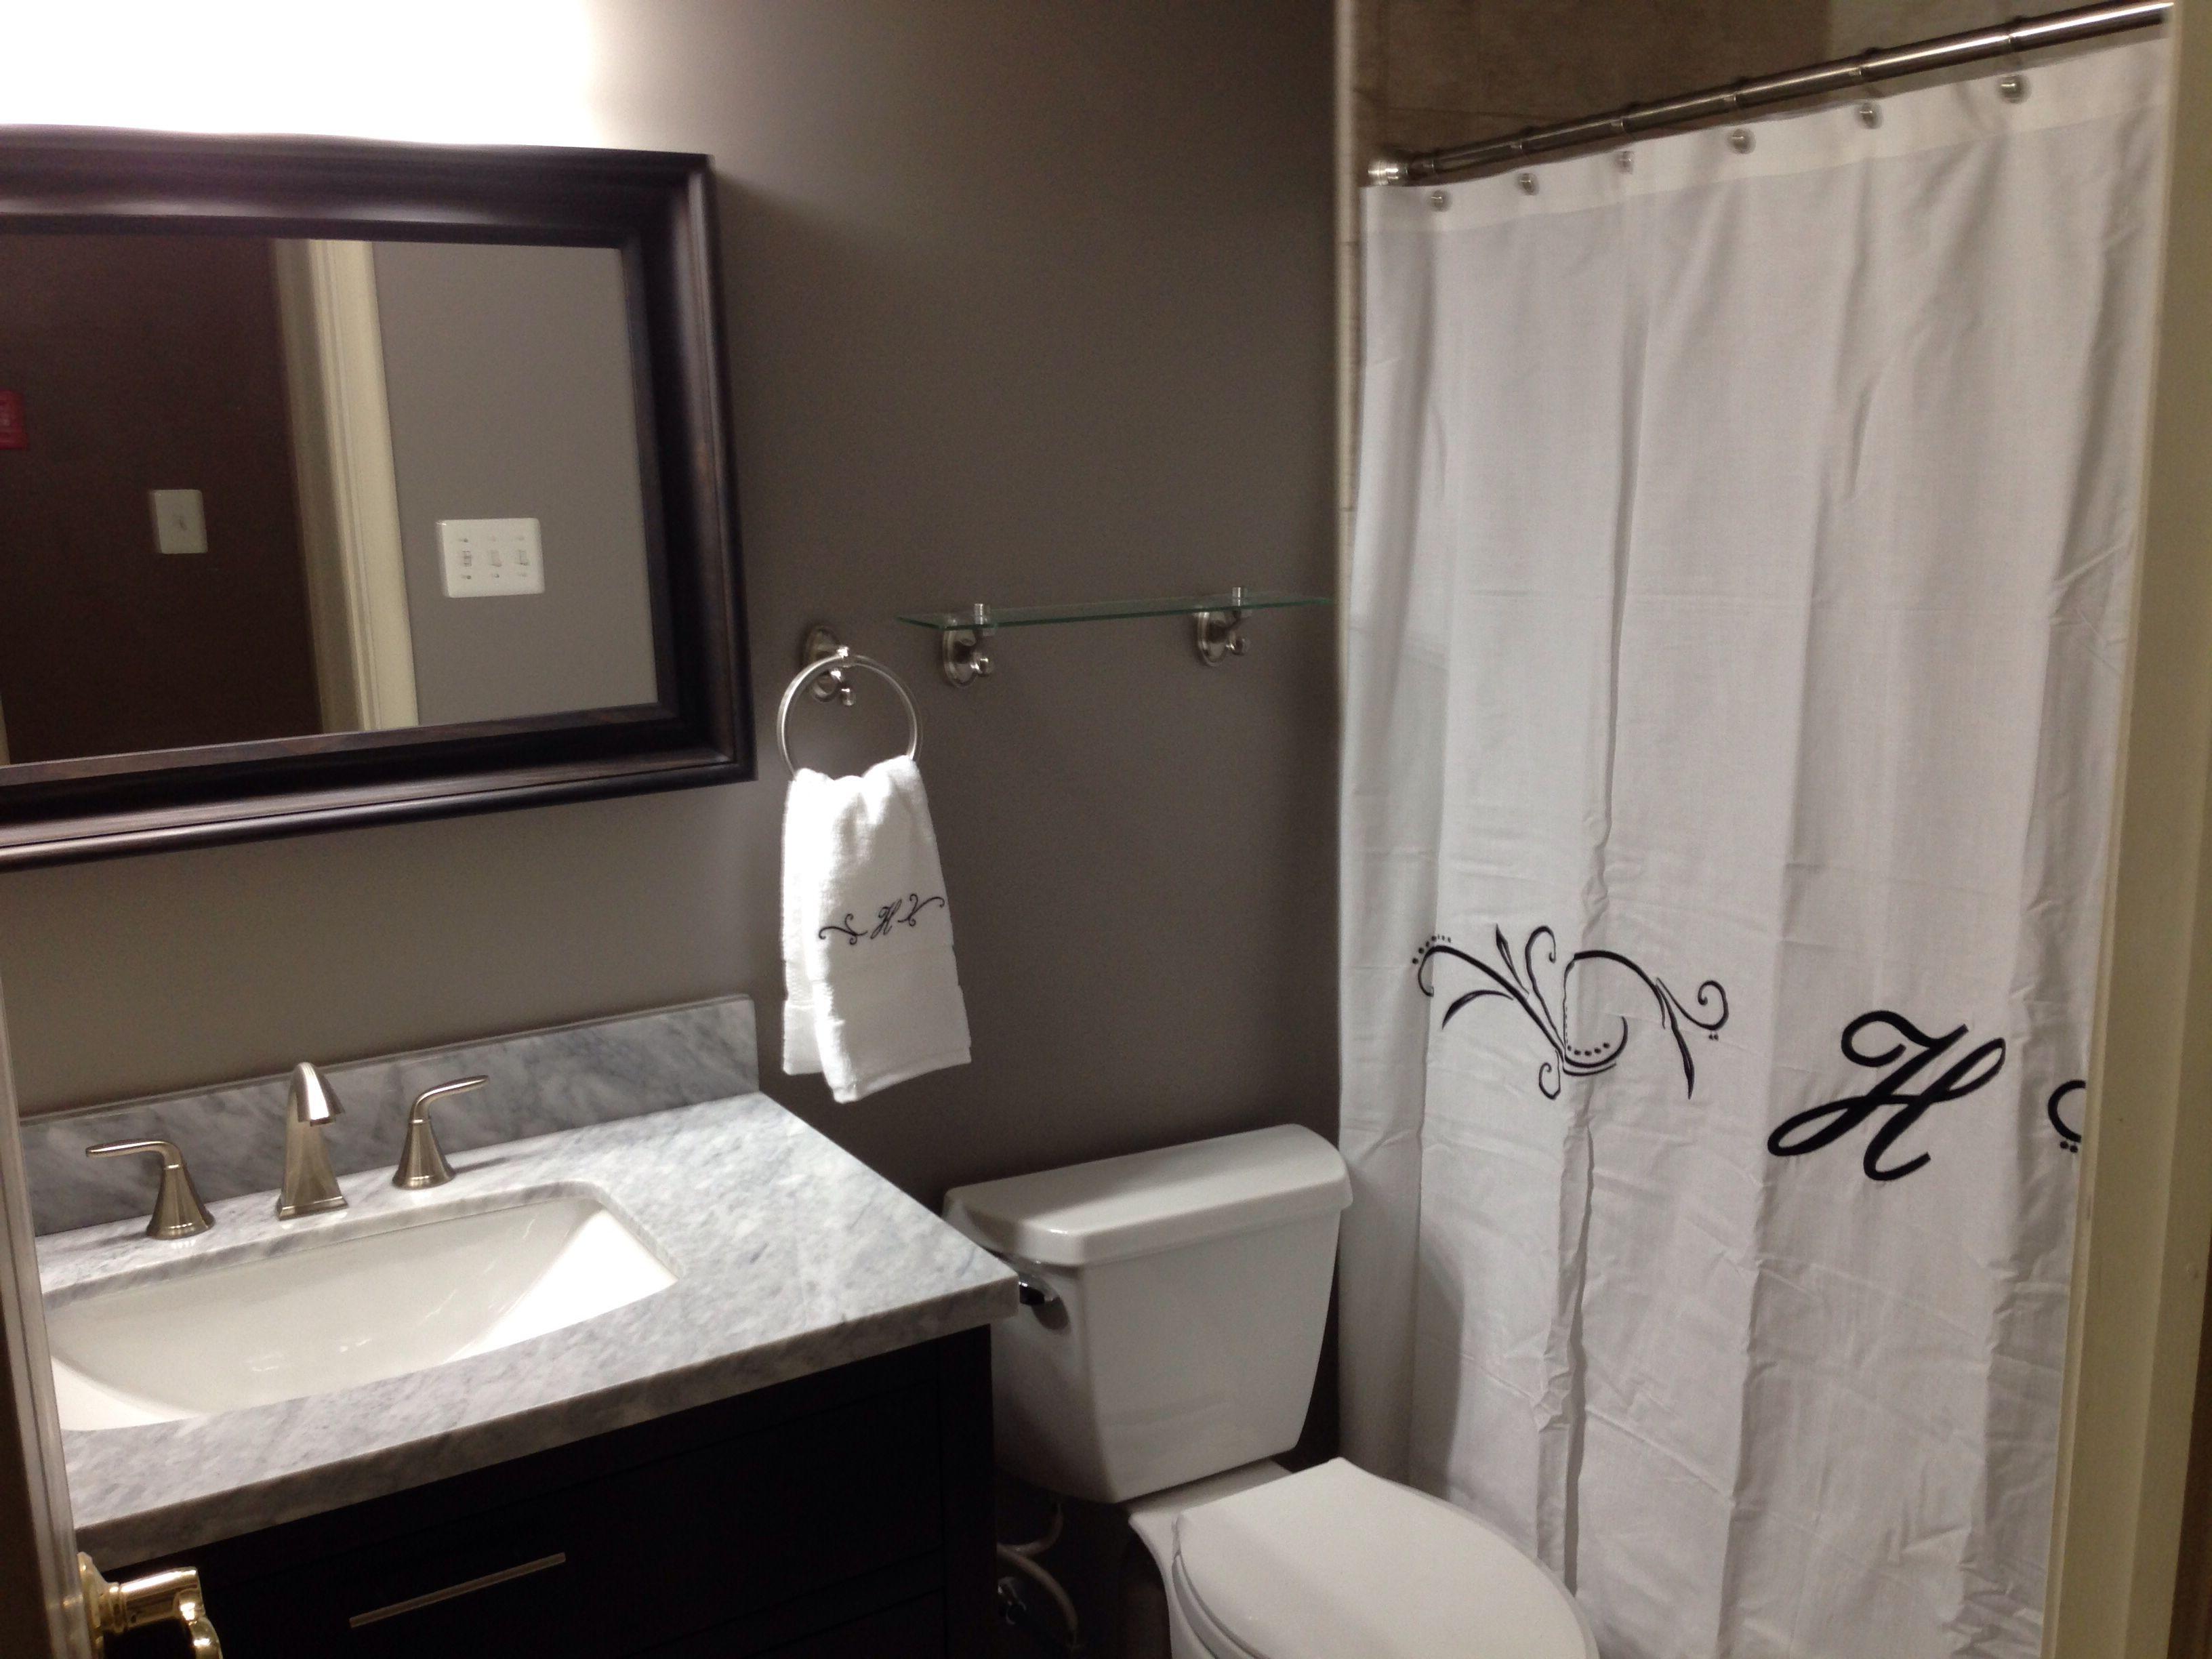 My Bathroom Renovation! Whew! Paint